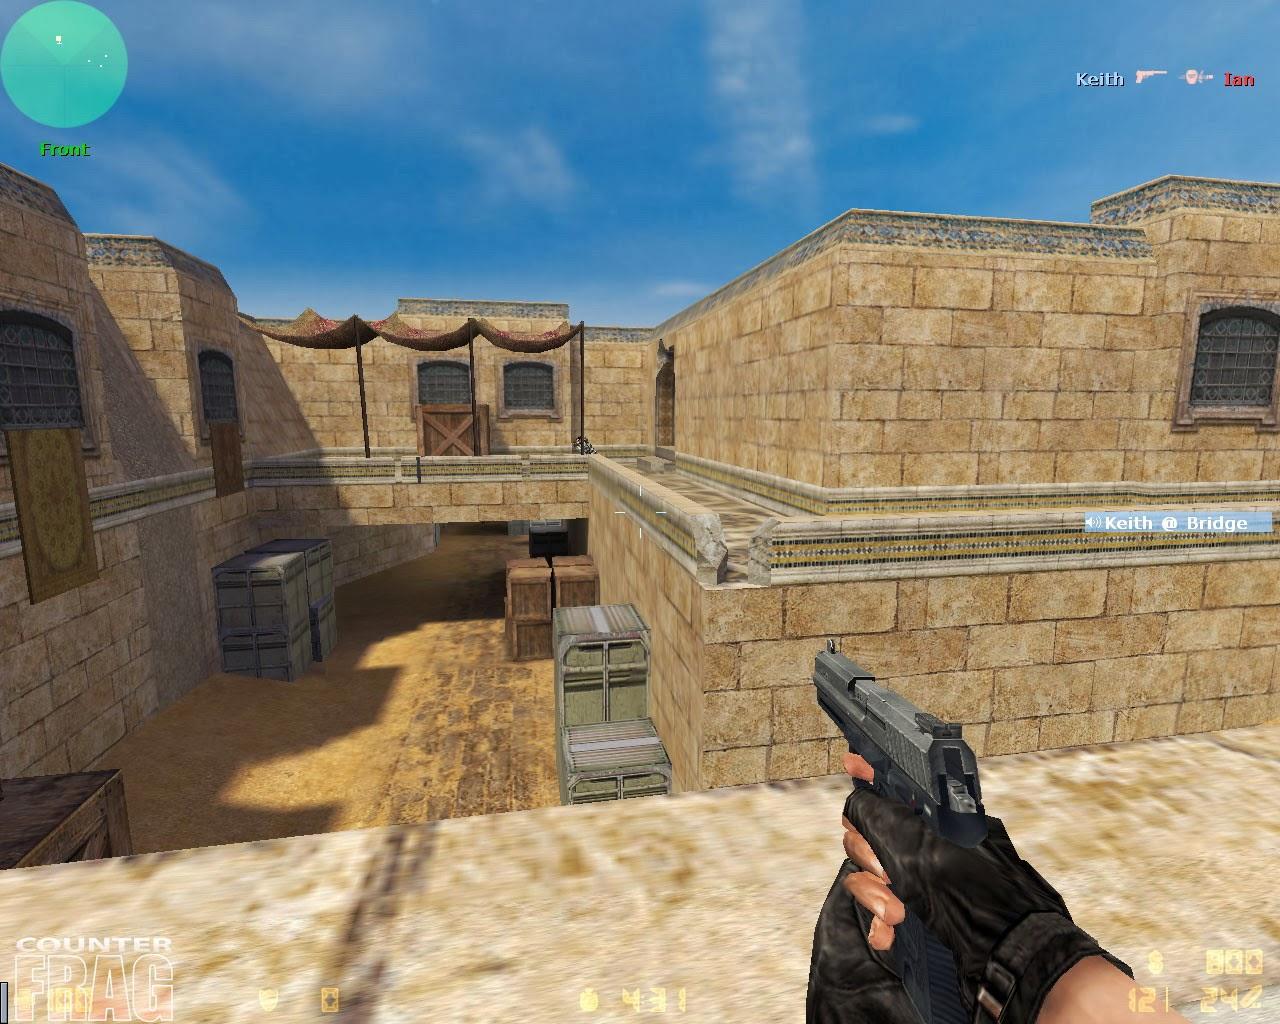 Counter Strike Condition Zero Download Free Full Version PC Games